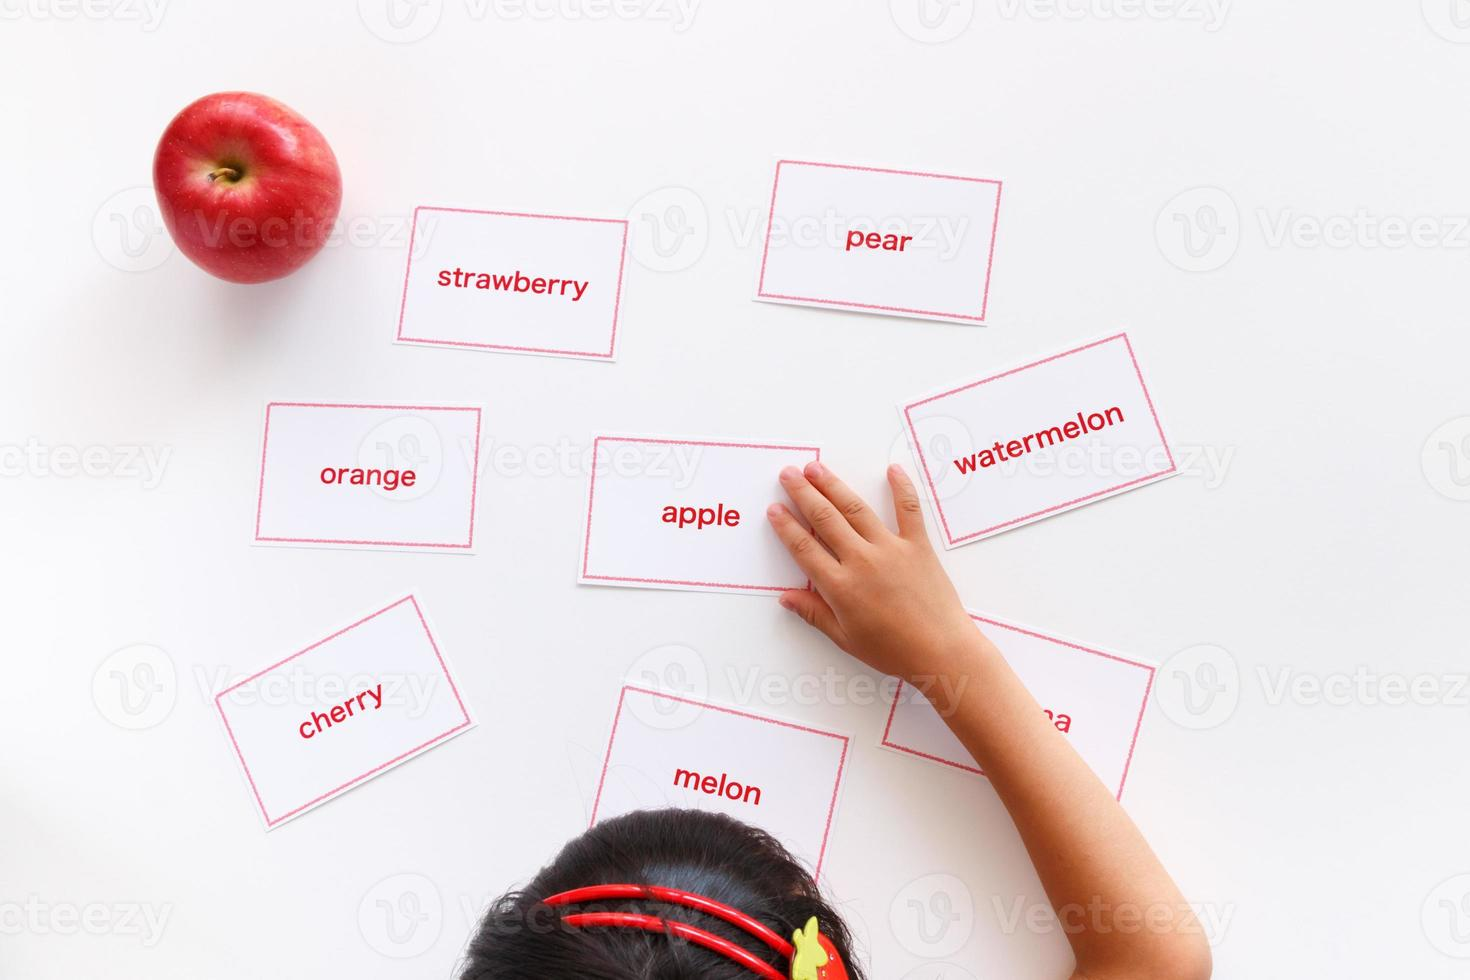 étude du mot anglais photo